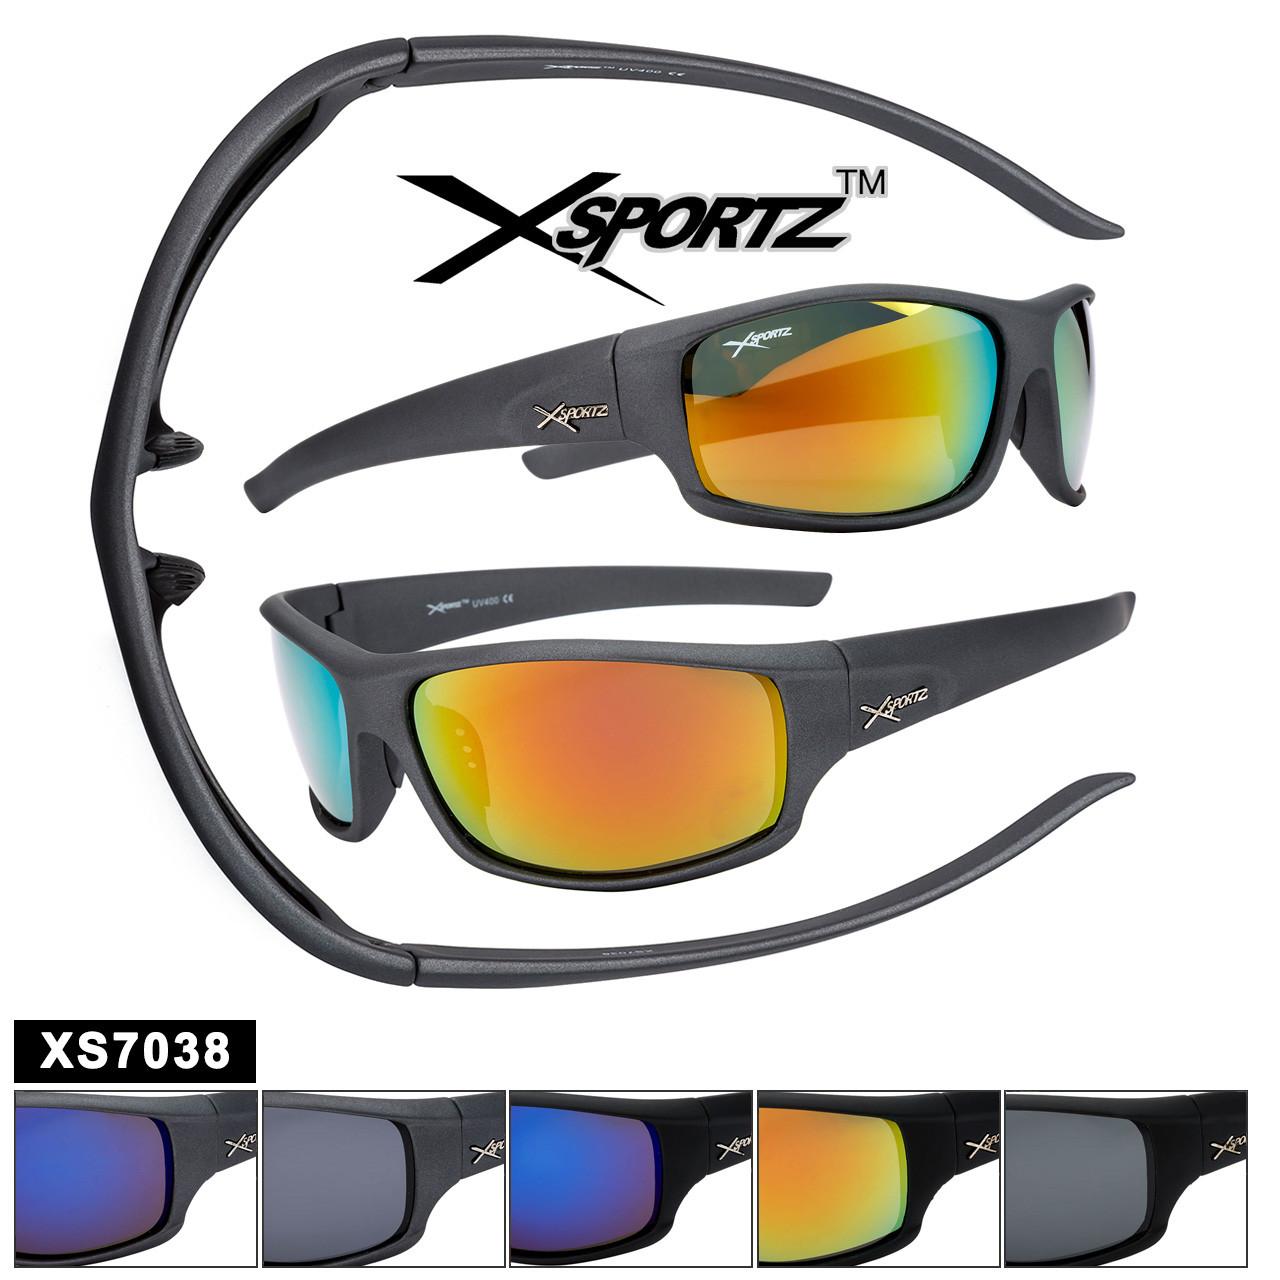 Bulk Polarized Xsportz™ Sports Sunglasses XS7038